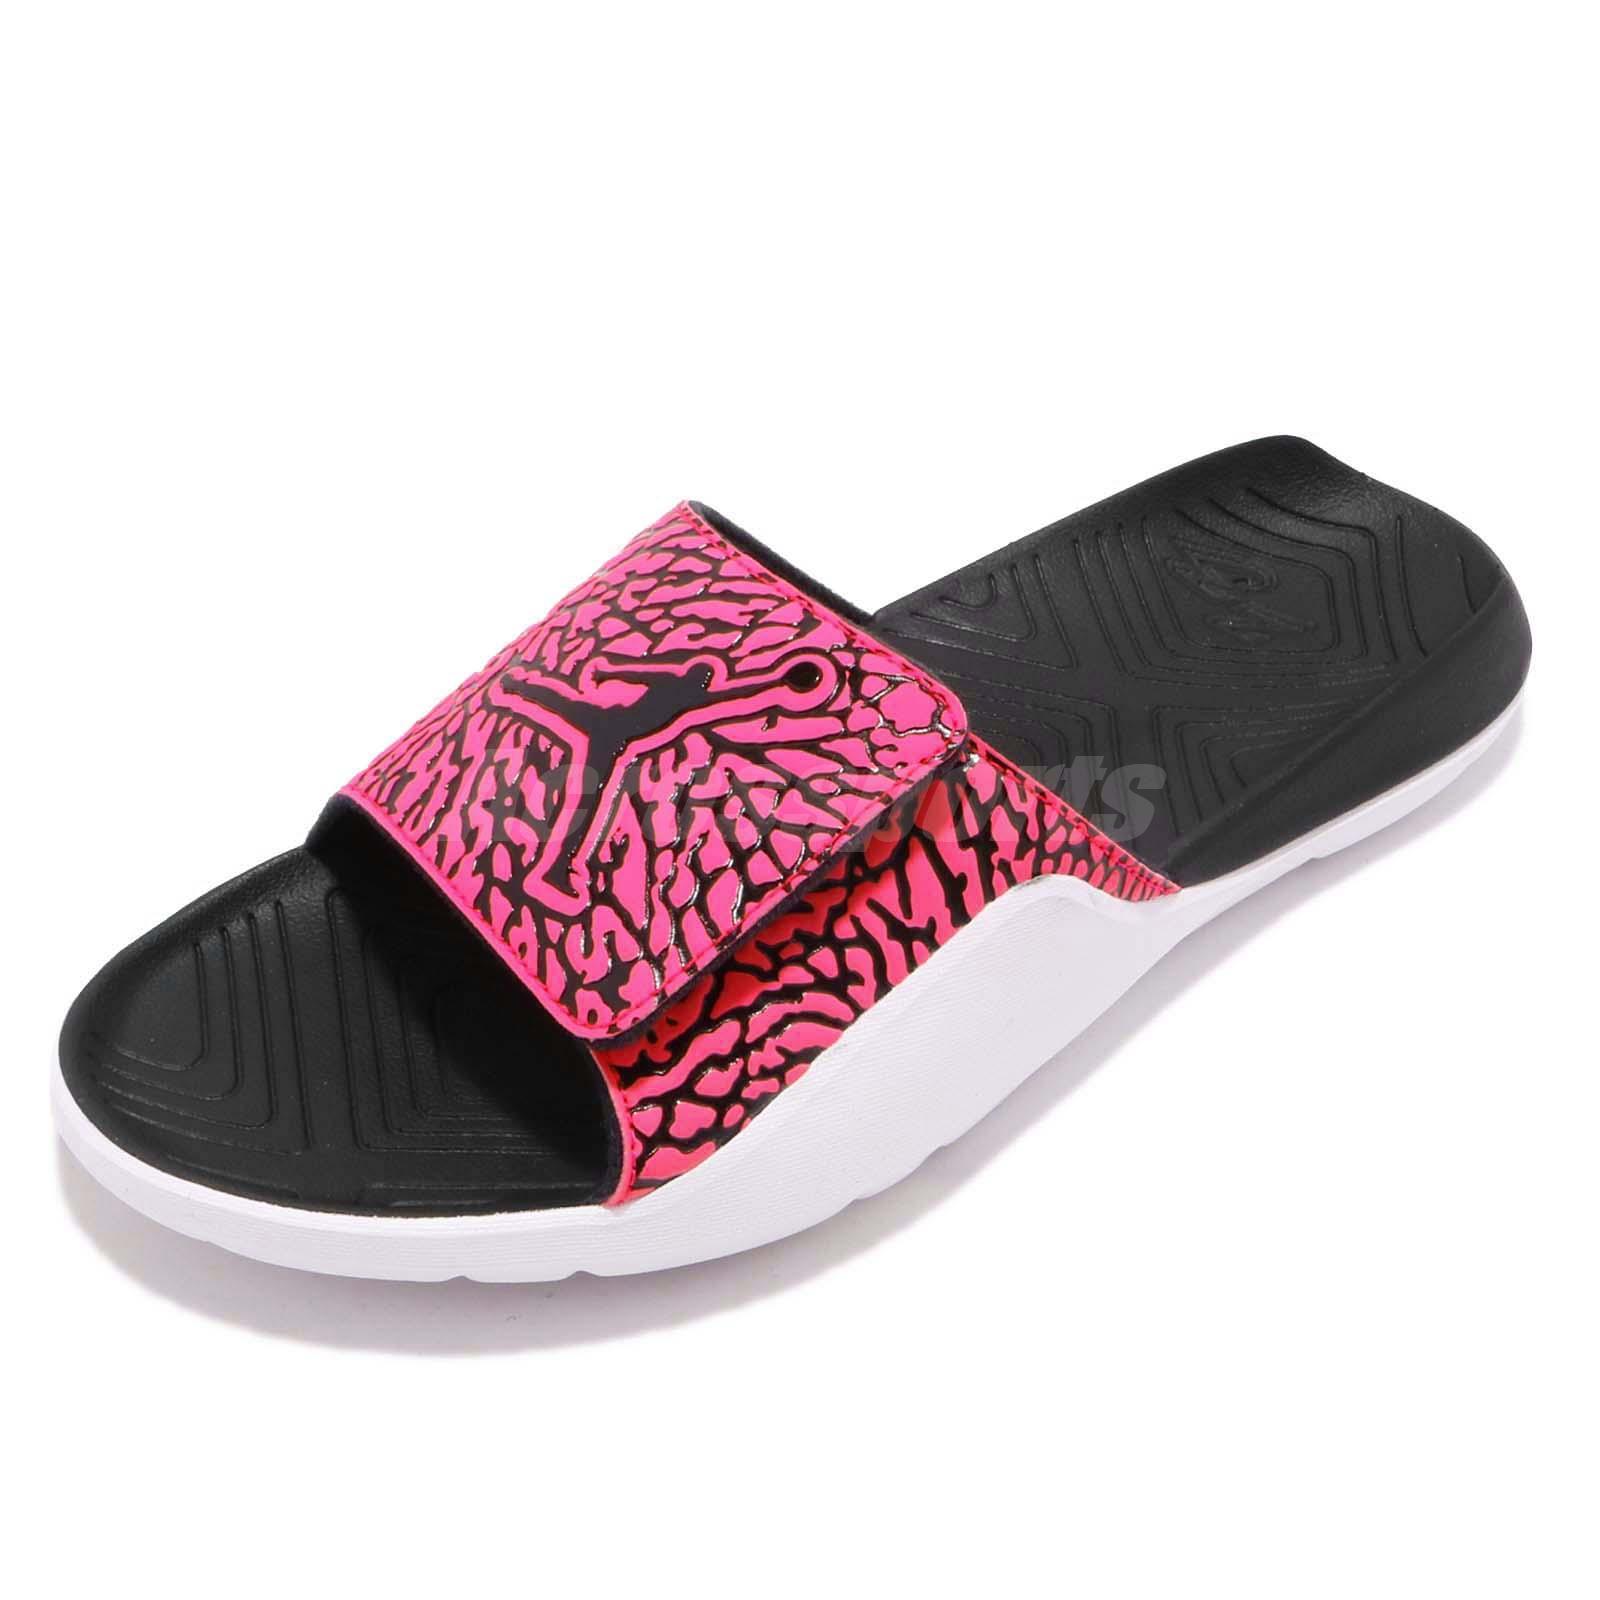 d1ae41473 Nike Jordan Hydro 7 V2 Black Pink Men Sports Sandals Slides Slippers  BQ6290-061